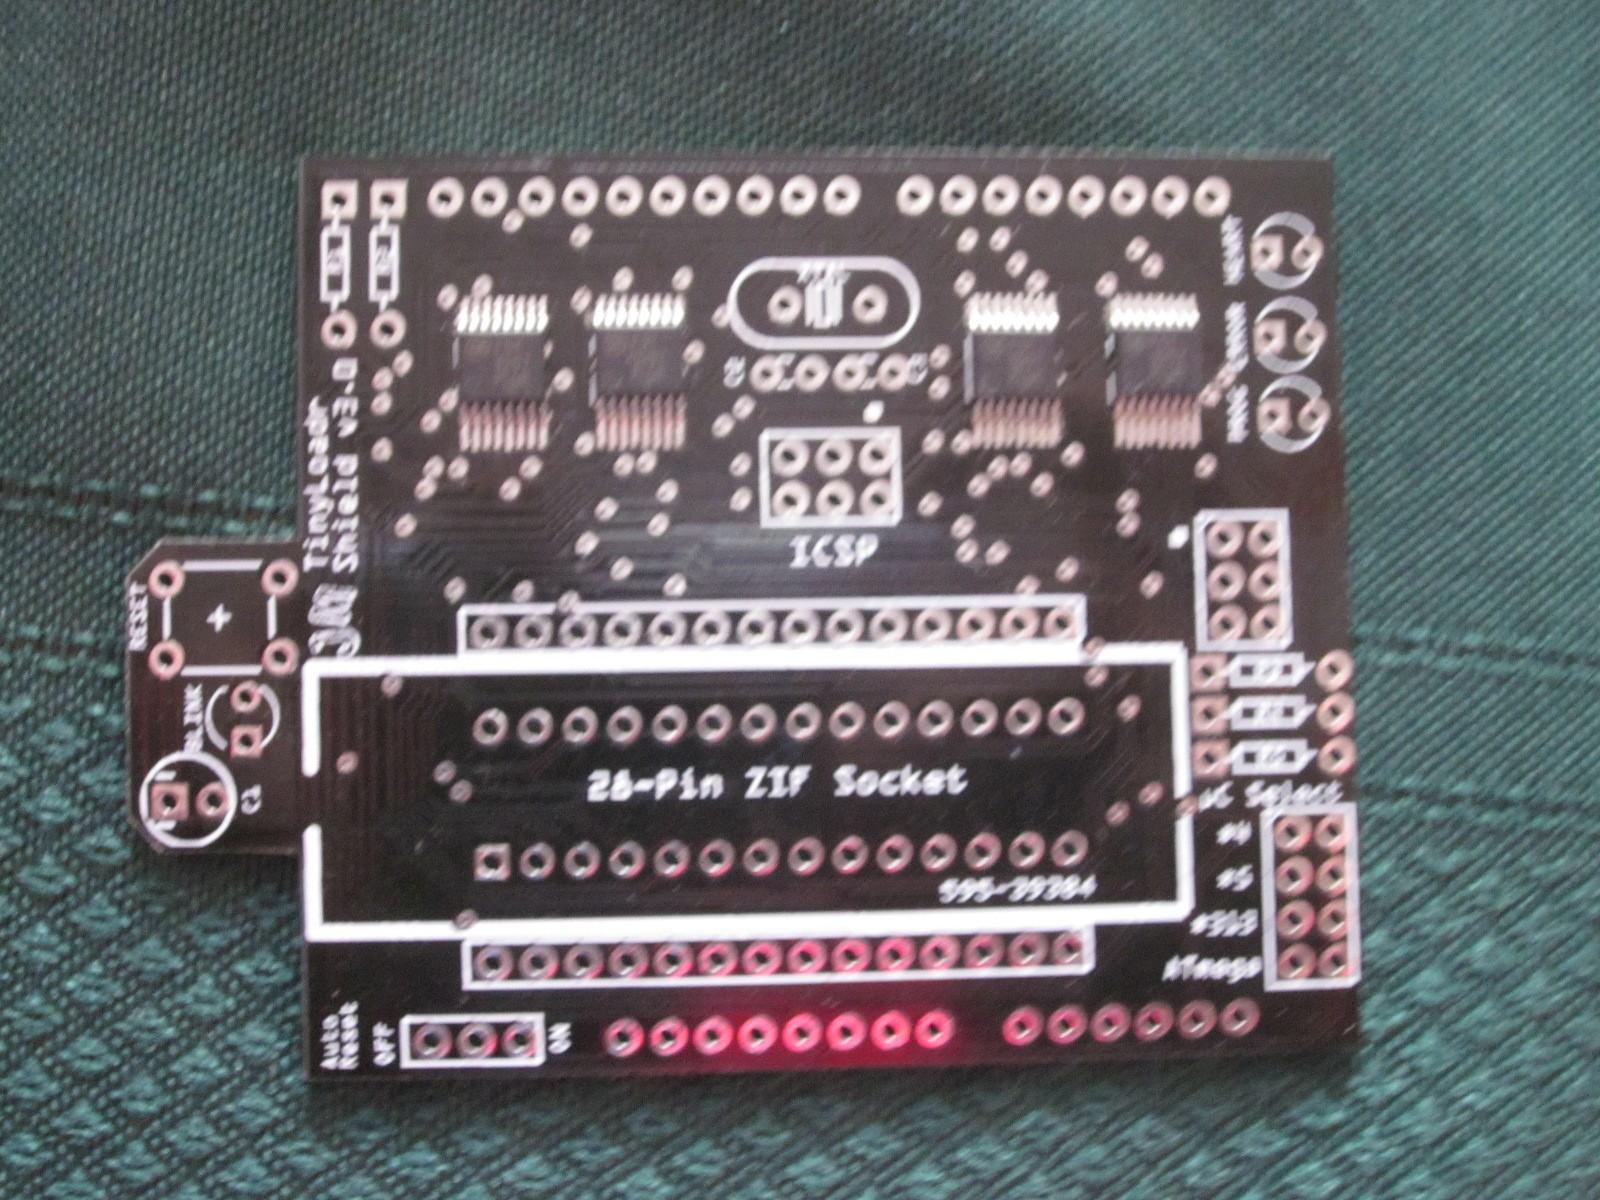 The TinyLoadr Shield Programs AVRs From Your Arduino